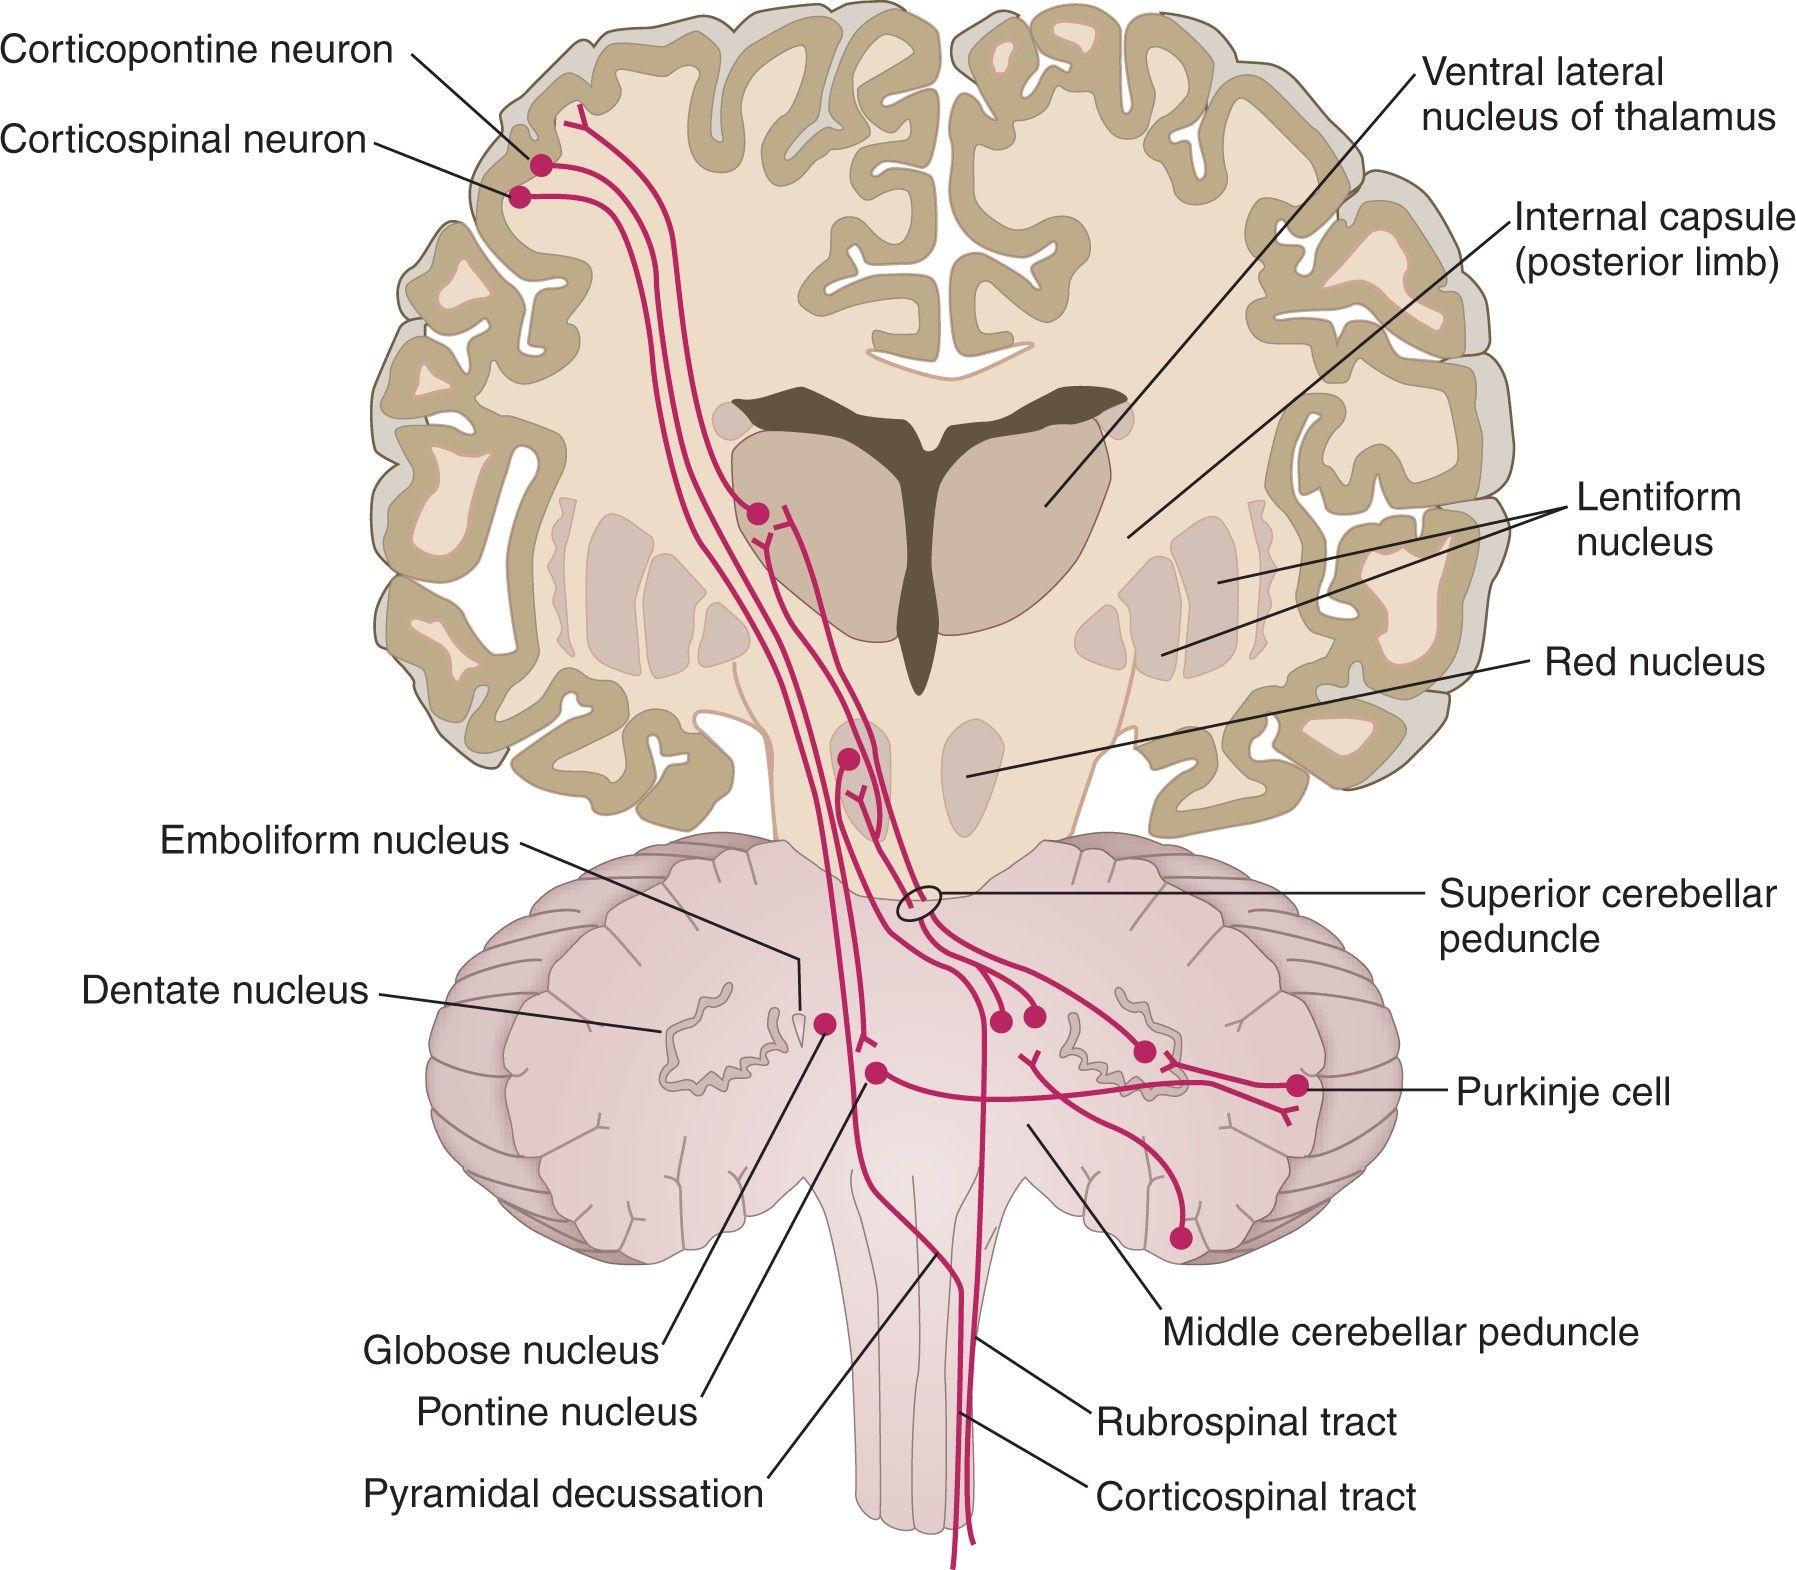 Cerebellar Pathways | Neuro | Pinterest | Brain, Medicine and Medical